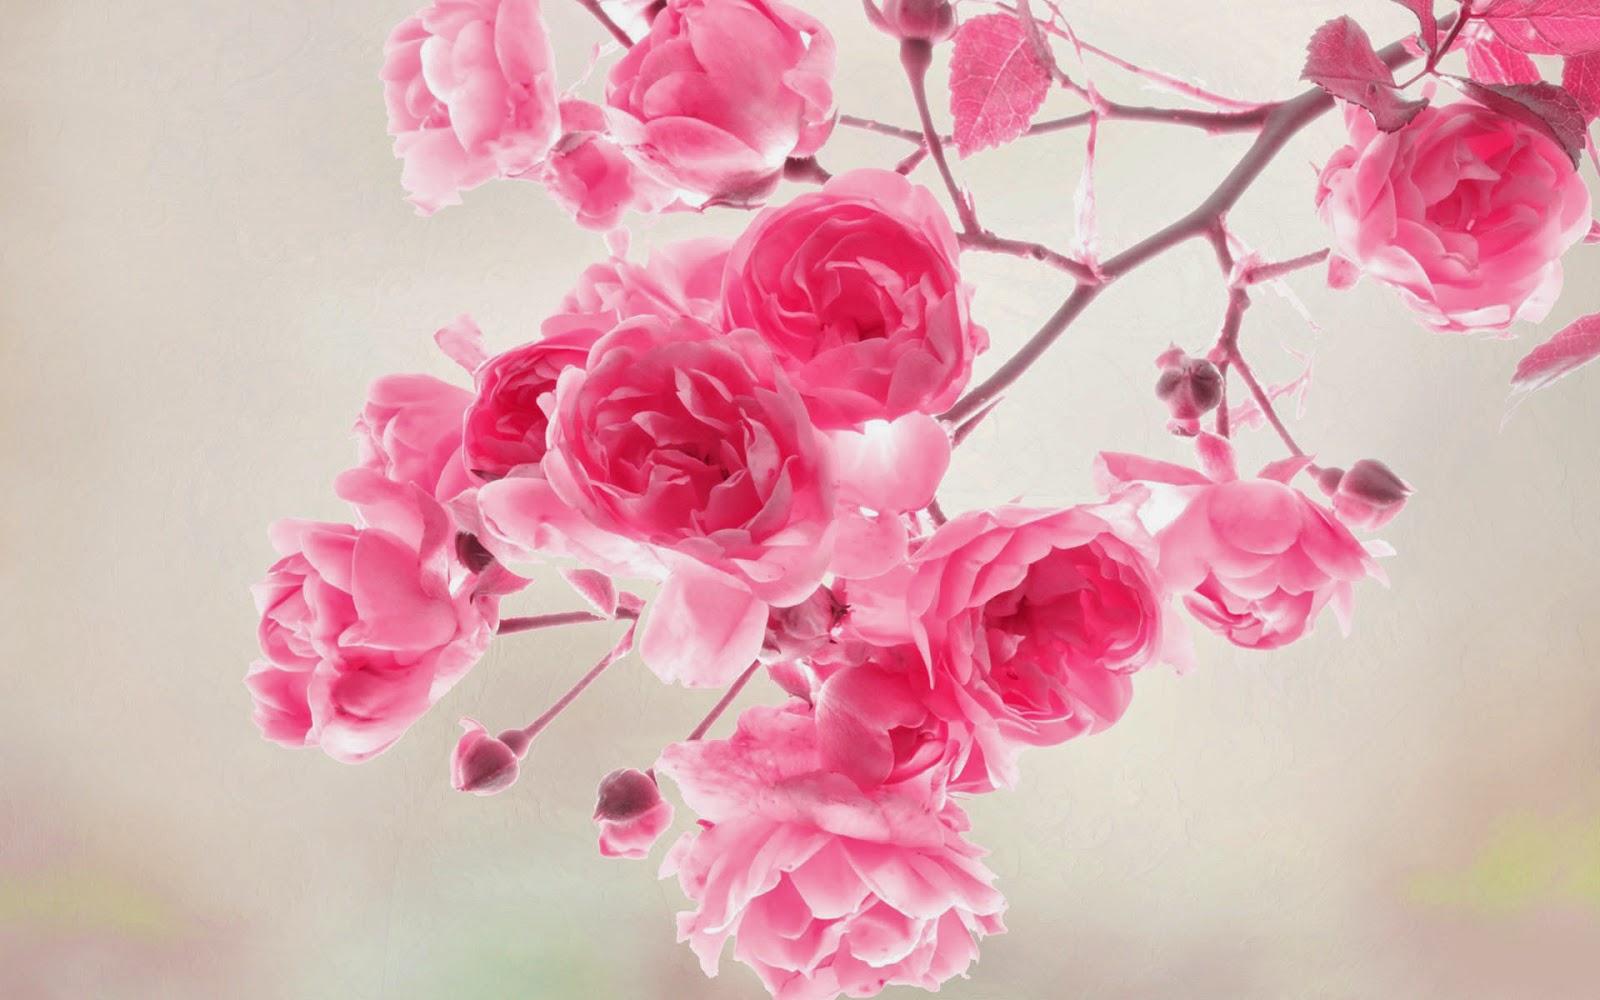 Friends club dp pink flower hd wallpapers dp pink flower hd wallpapers mightylinksfo